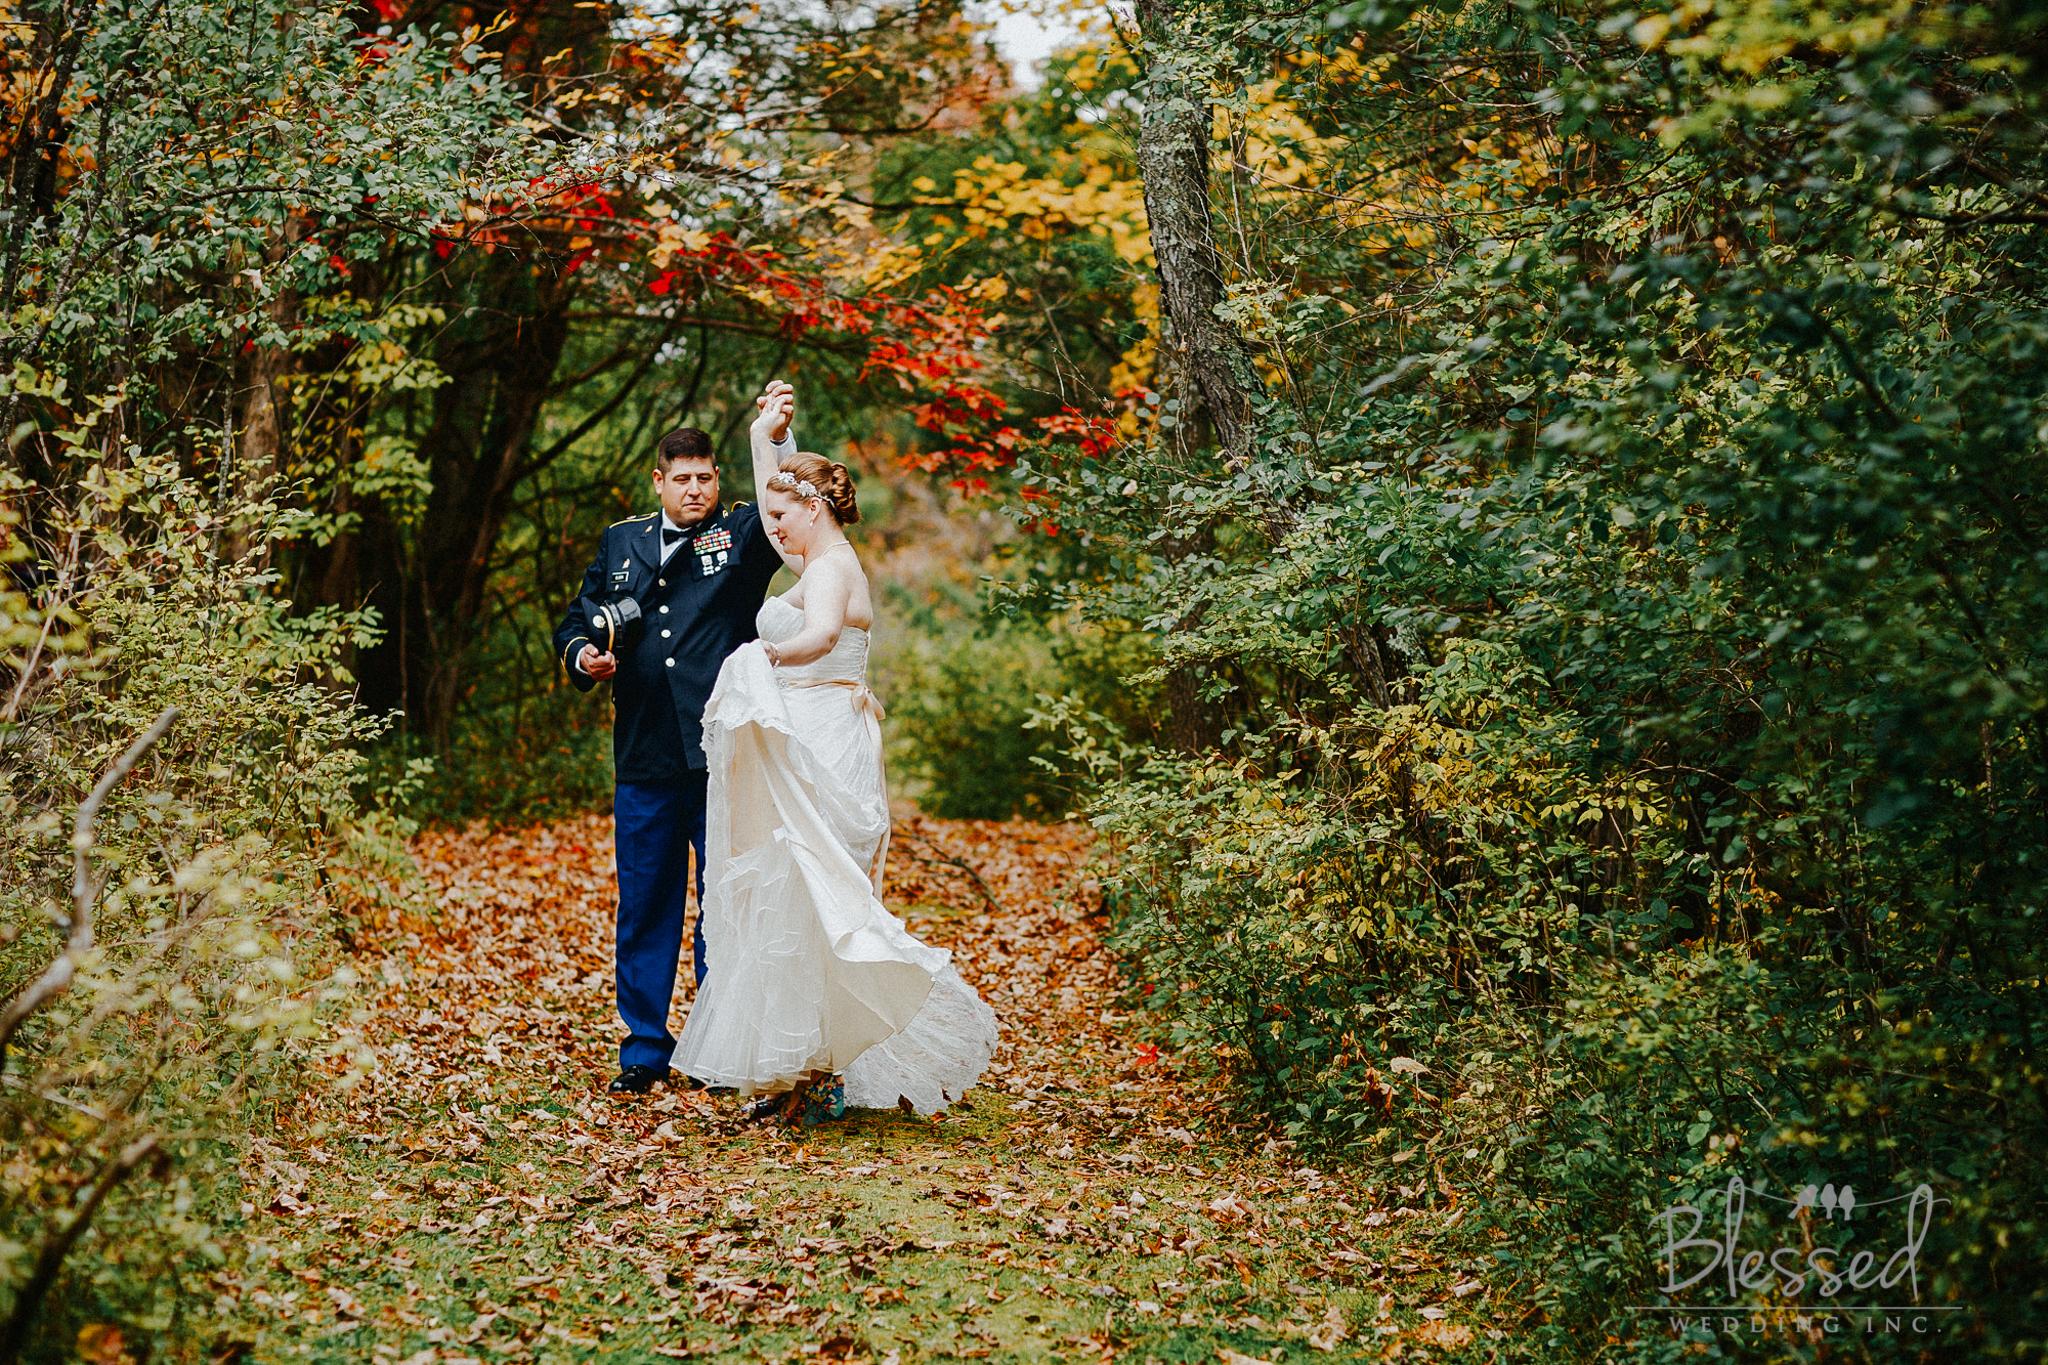 Destination Wedding Photography Minnesota By Blessed Wedding Photographers-13.jpg